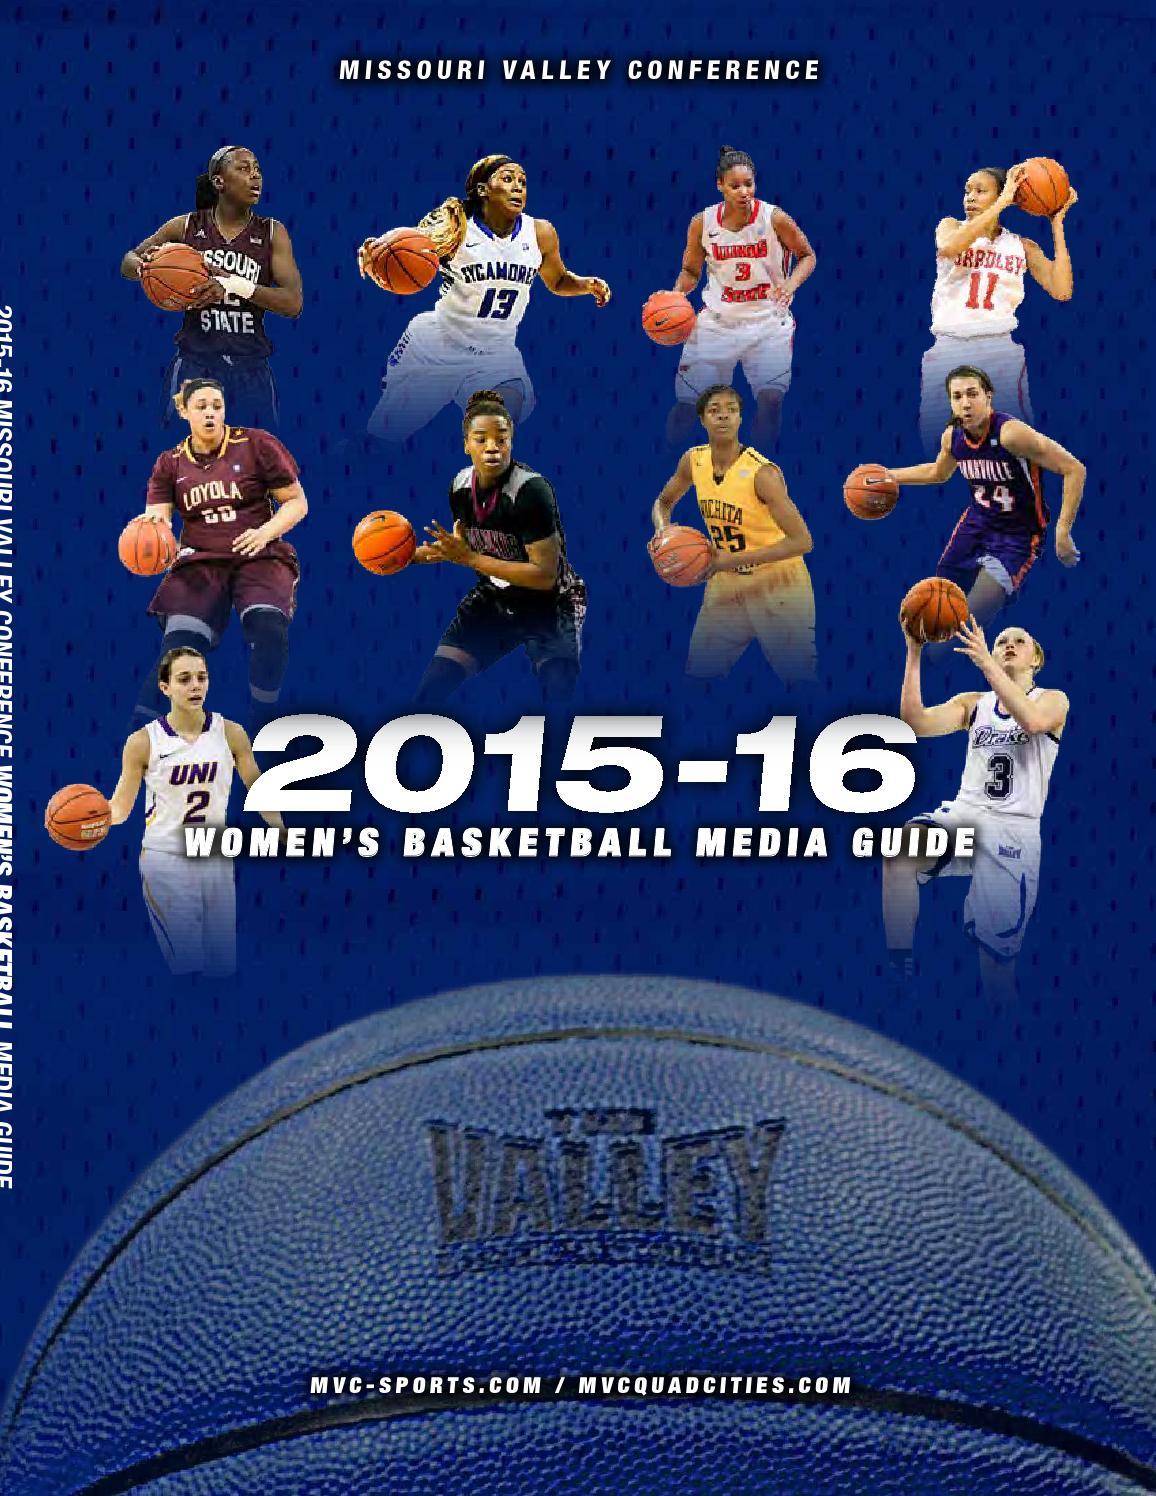 f2cad9d5b42e2 2015-16 MVC Women's Basketball Media Guide by Missouri Valley ...